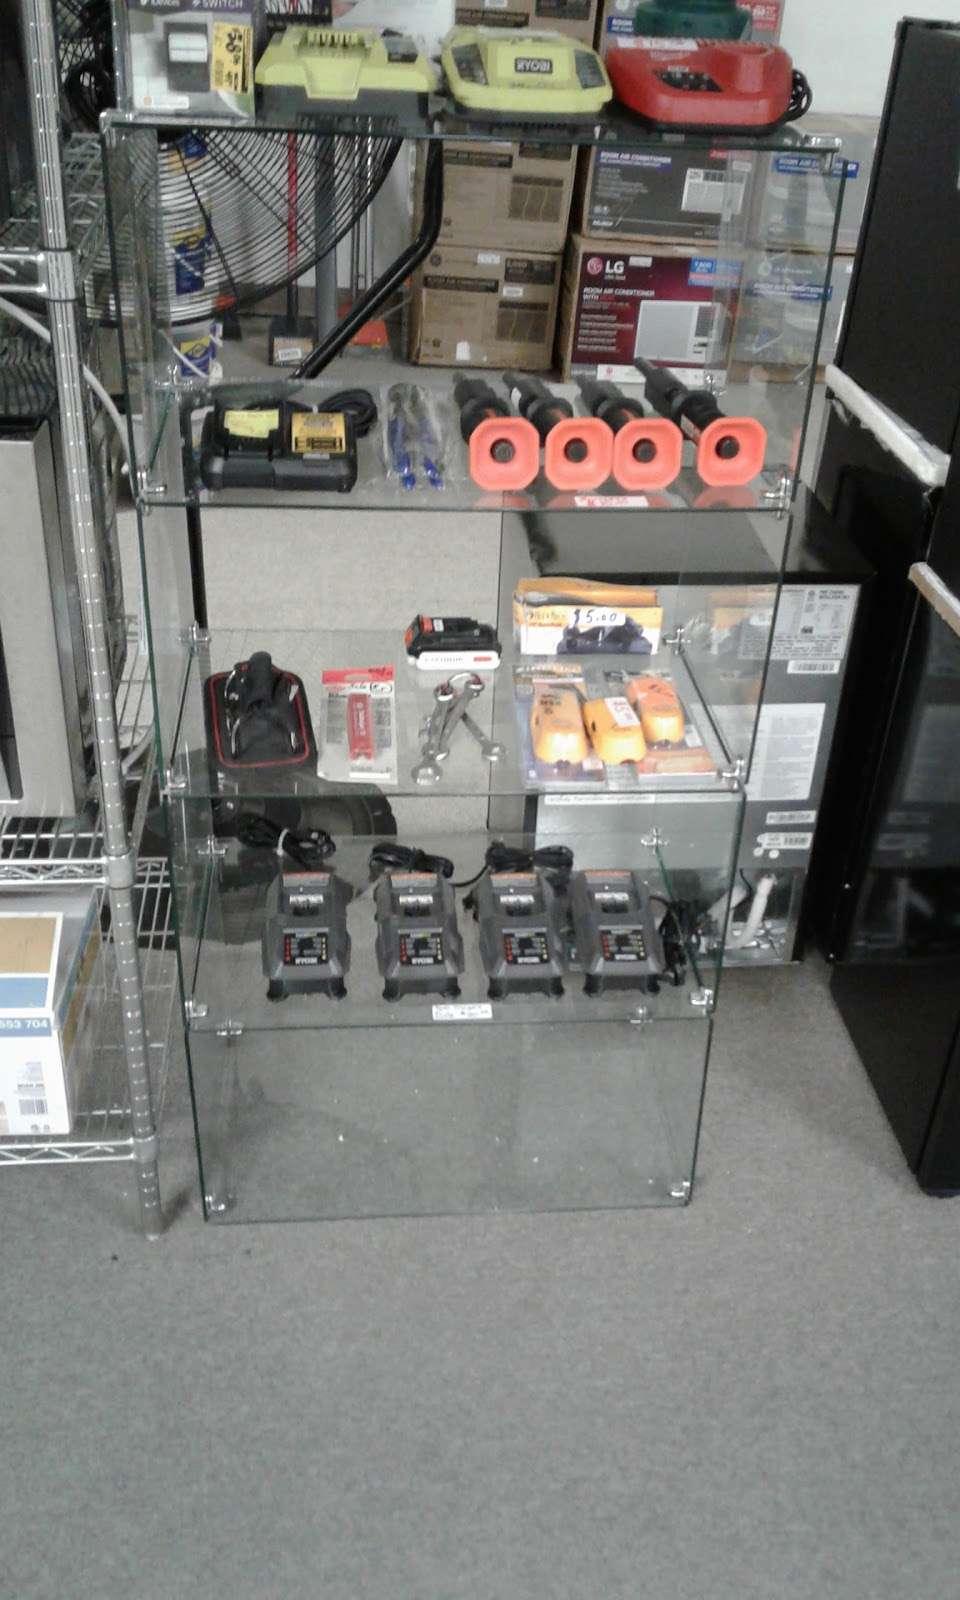 Half Price Hardware - hardware store  | Photo 7 of 10 | Address: 520 Main St, Delta, PA 17314, USA | Phone: (443) 528-8543